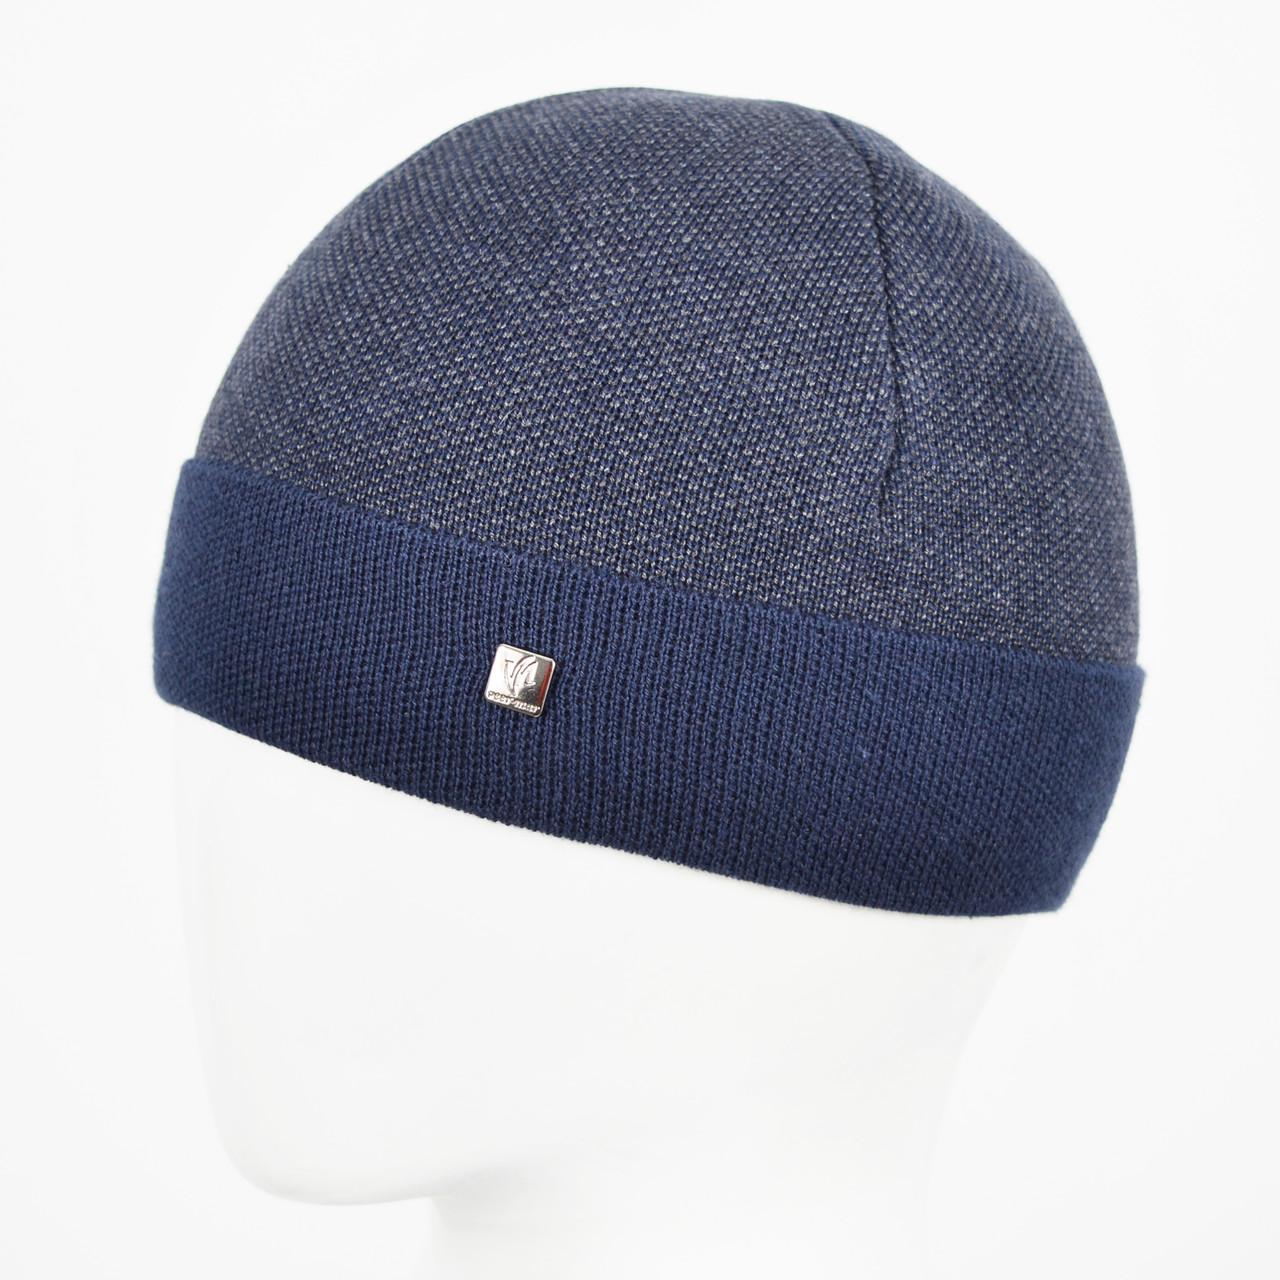 Мужская Шерстяная шапка Veer-Mar. SH980 синий+серый